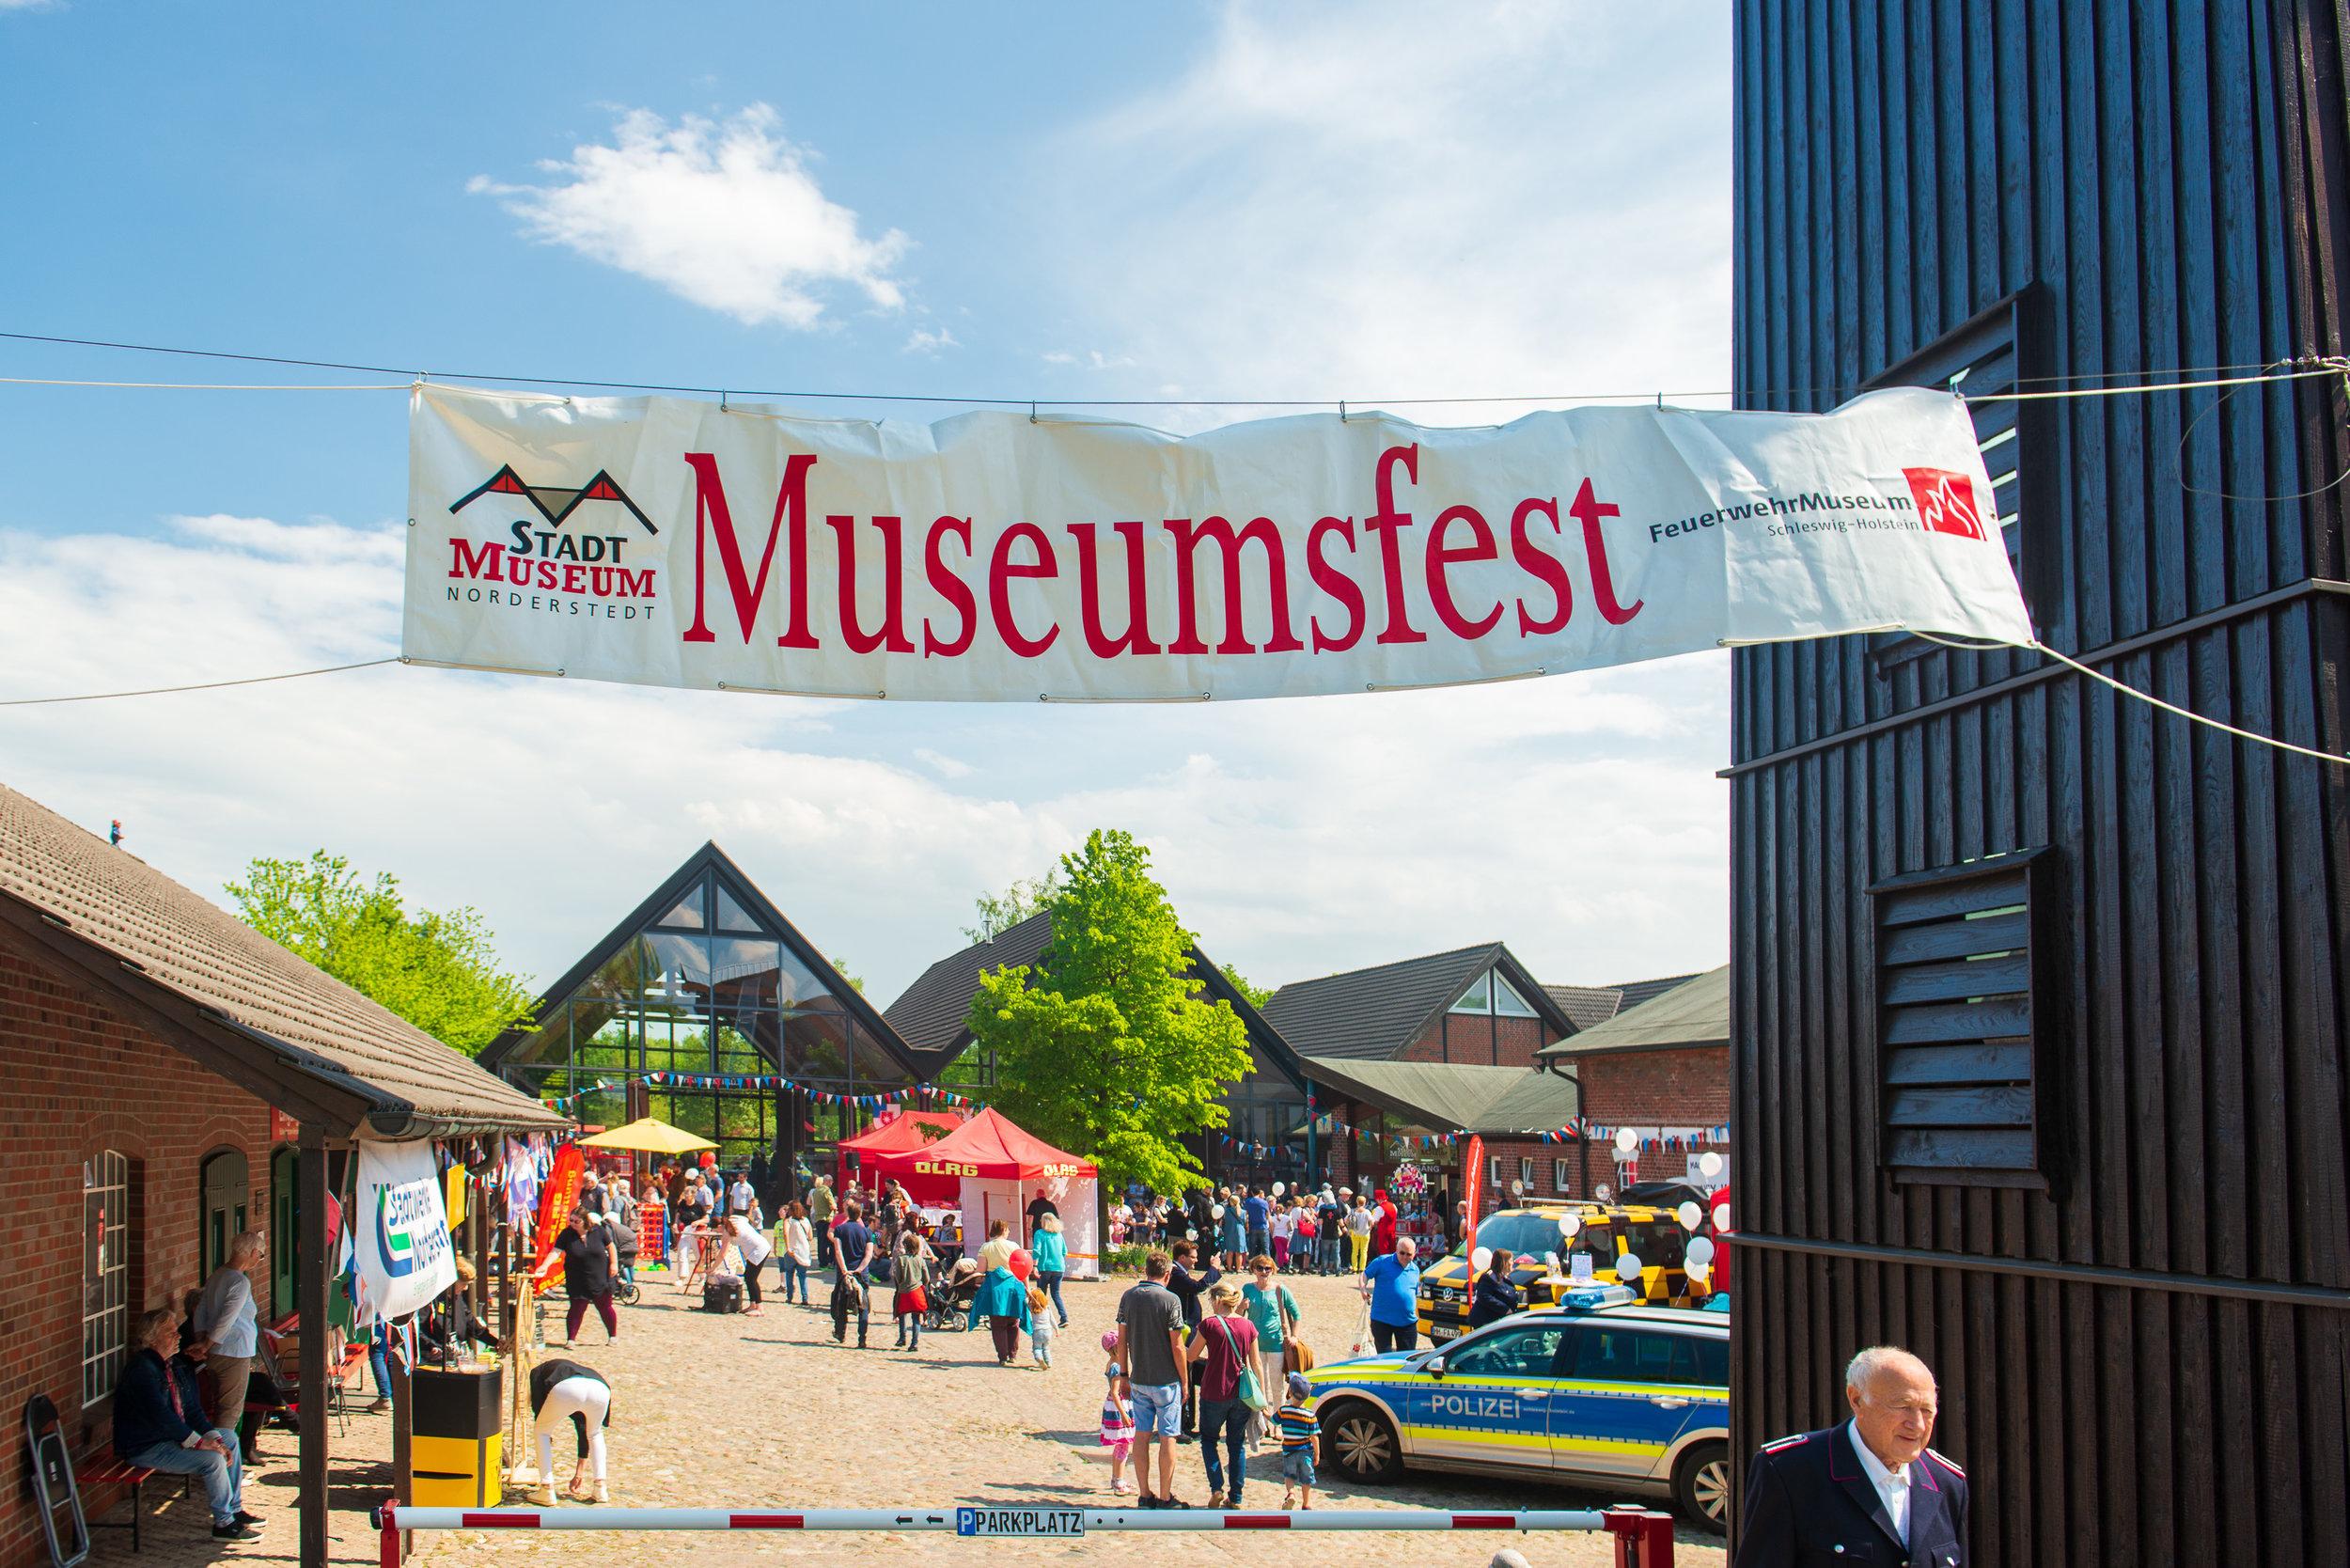 13-Norderstedter-Museumsfest-2019-FWM--XO-Dennys-Mamero-WEB-11.jpg